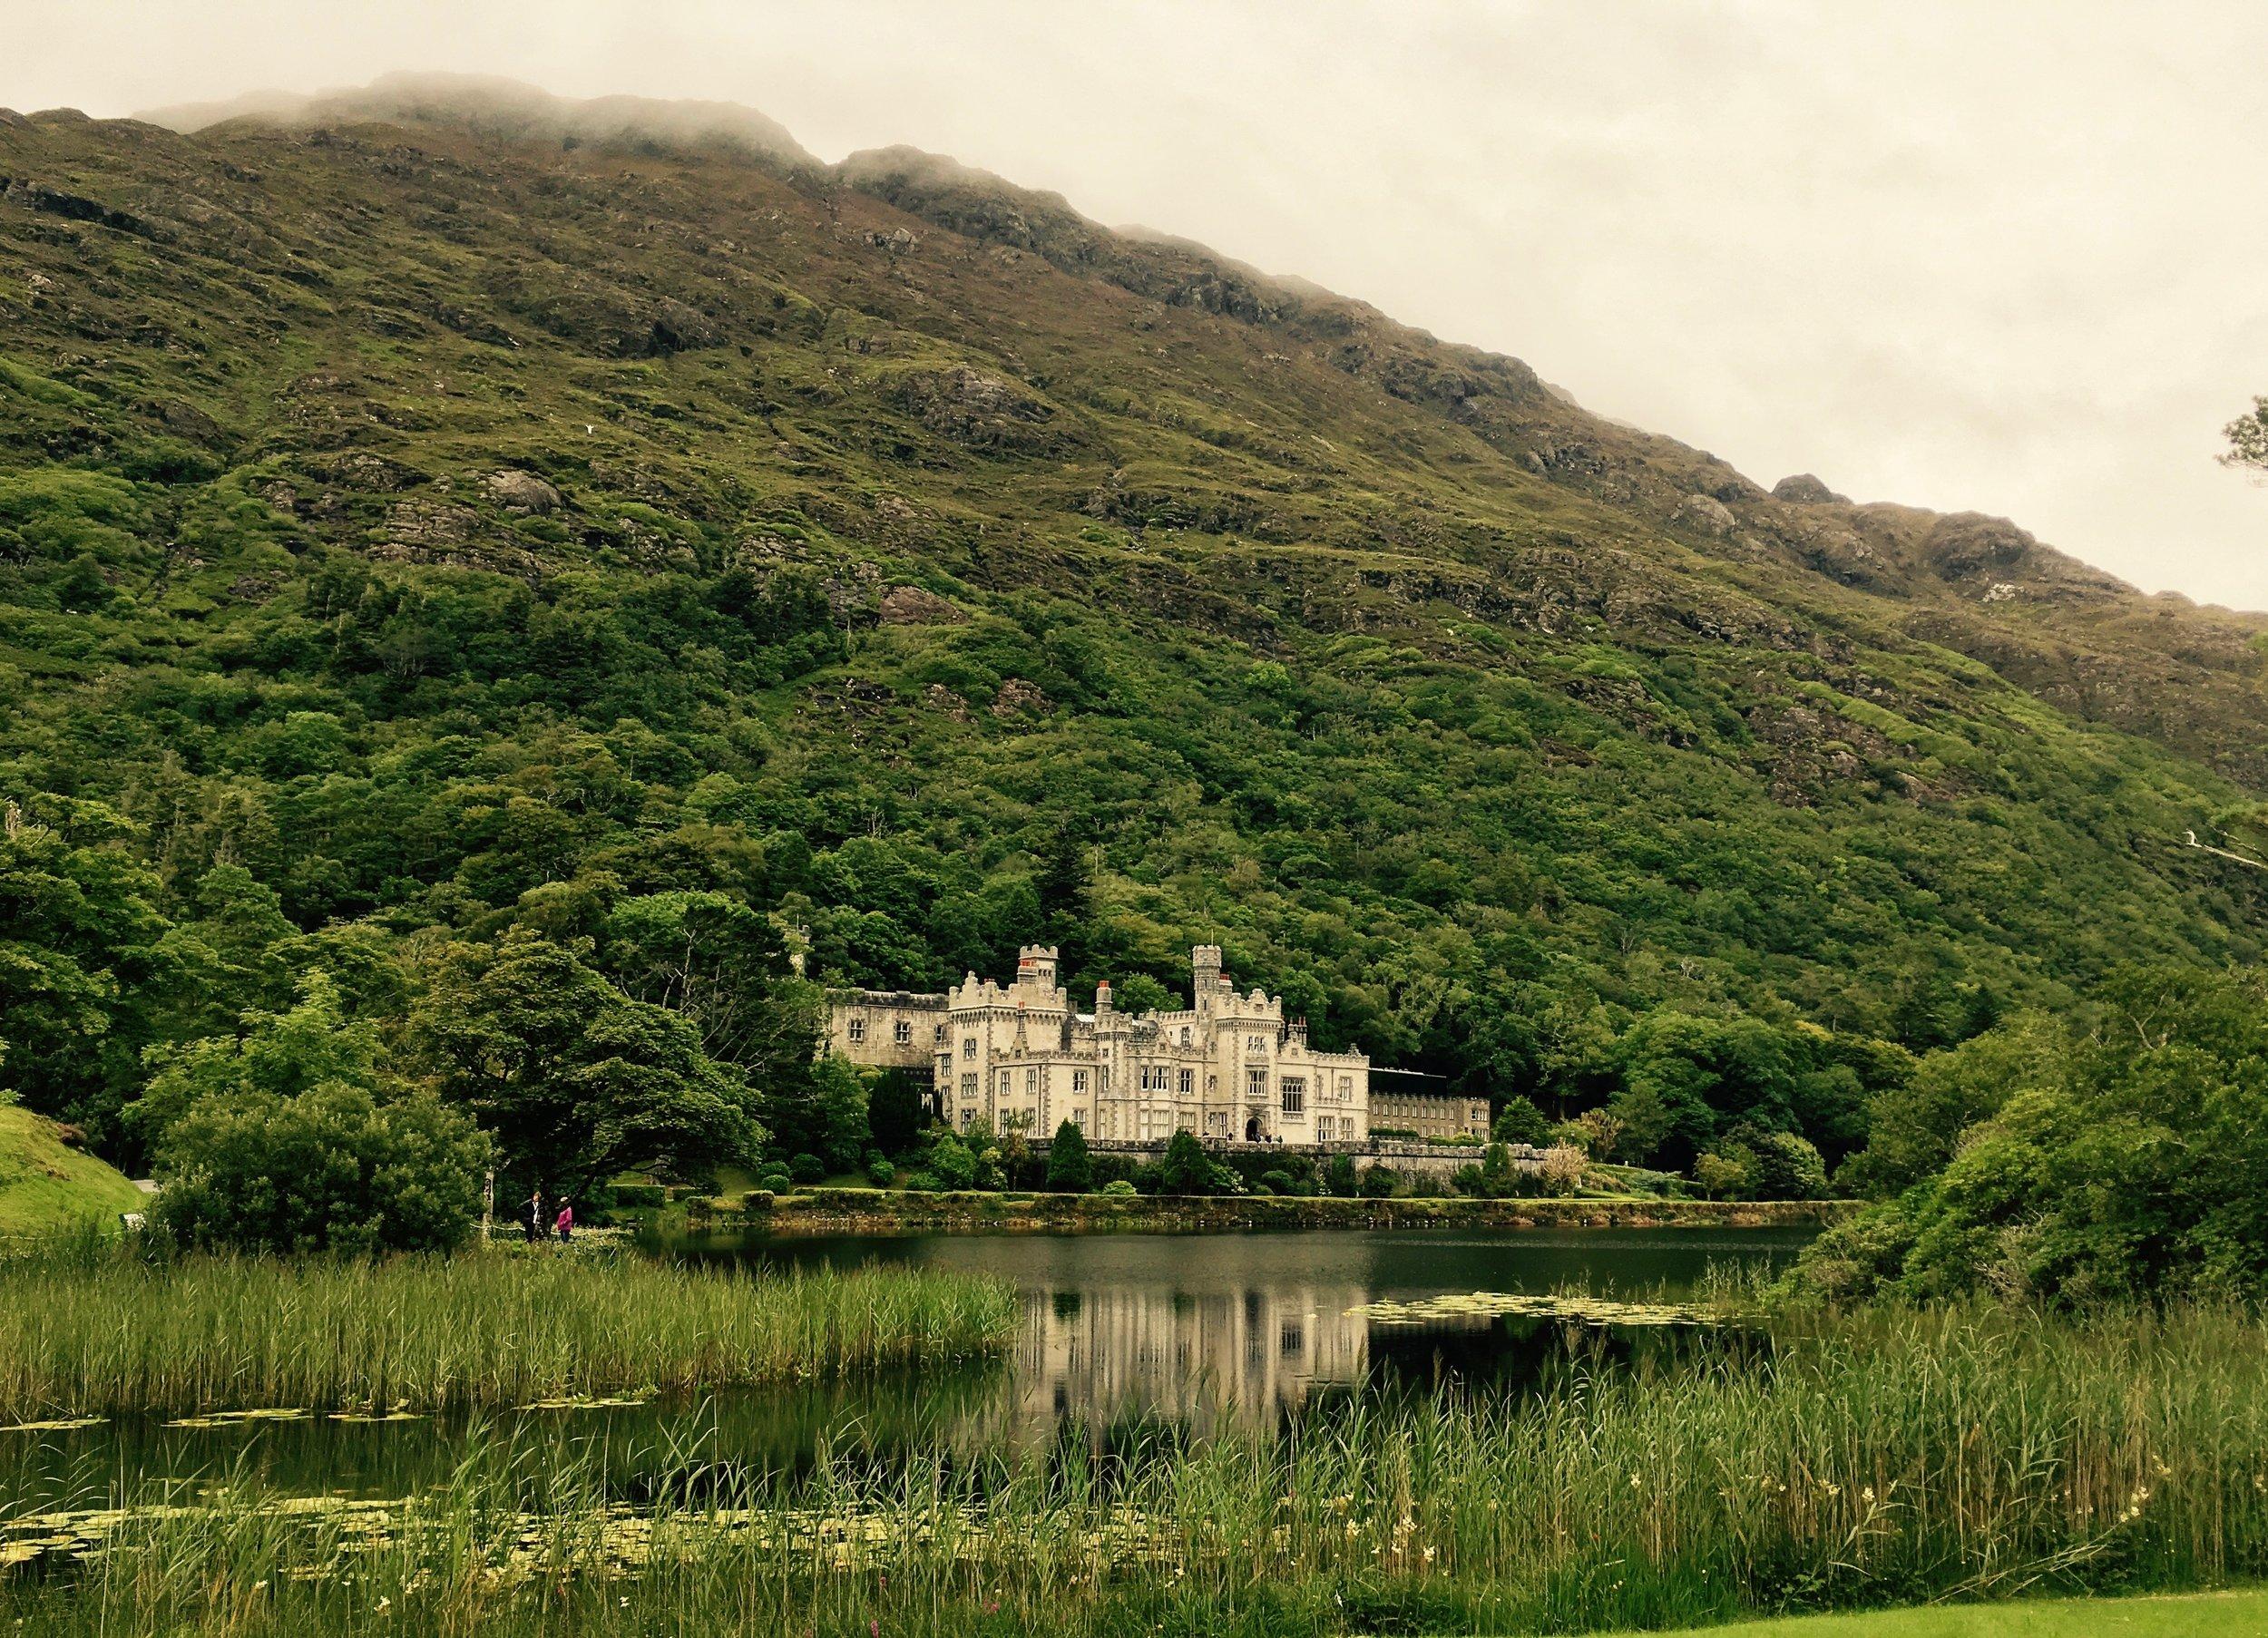 Kylemore Abbey Connemara Castle Ireland